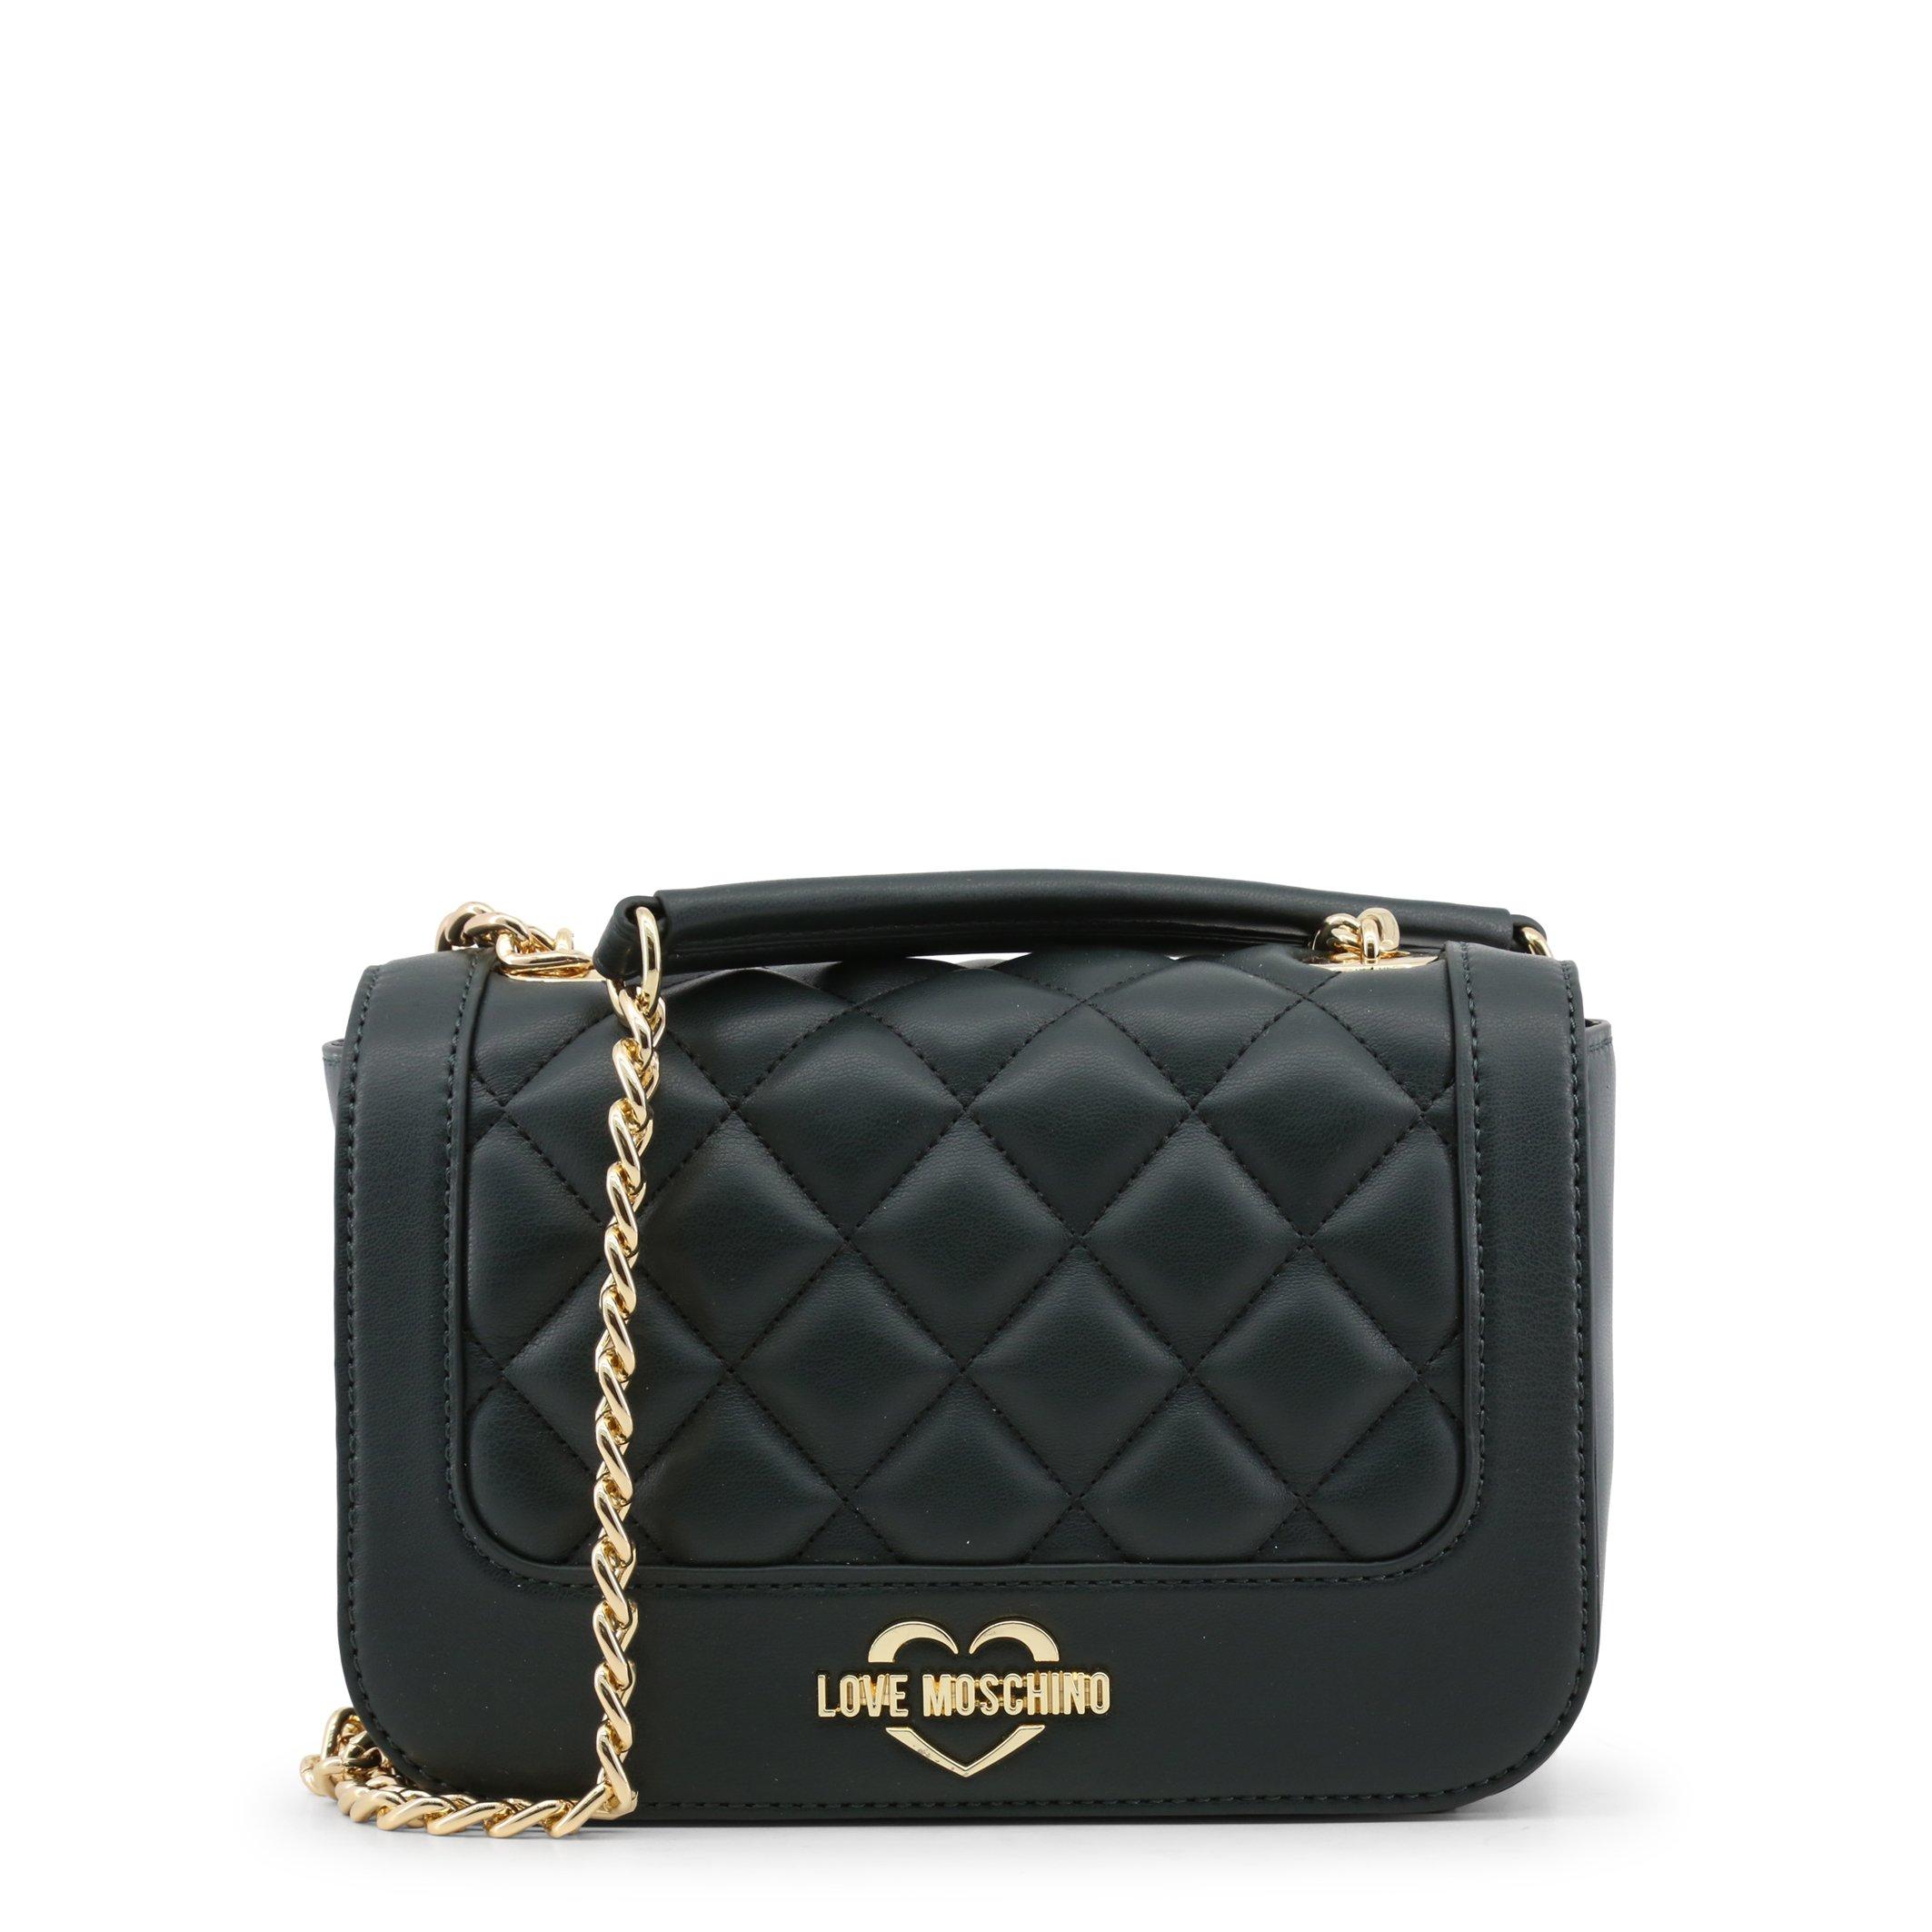 Love Moschino JC4208PP06KA | Crossbody bag, Brown crossbody